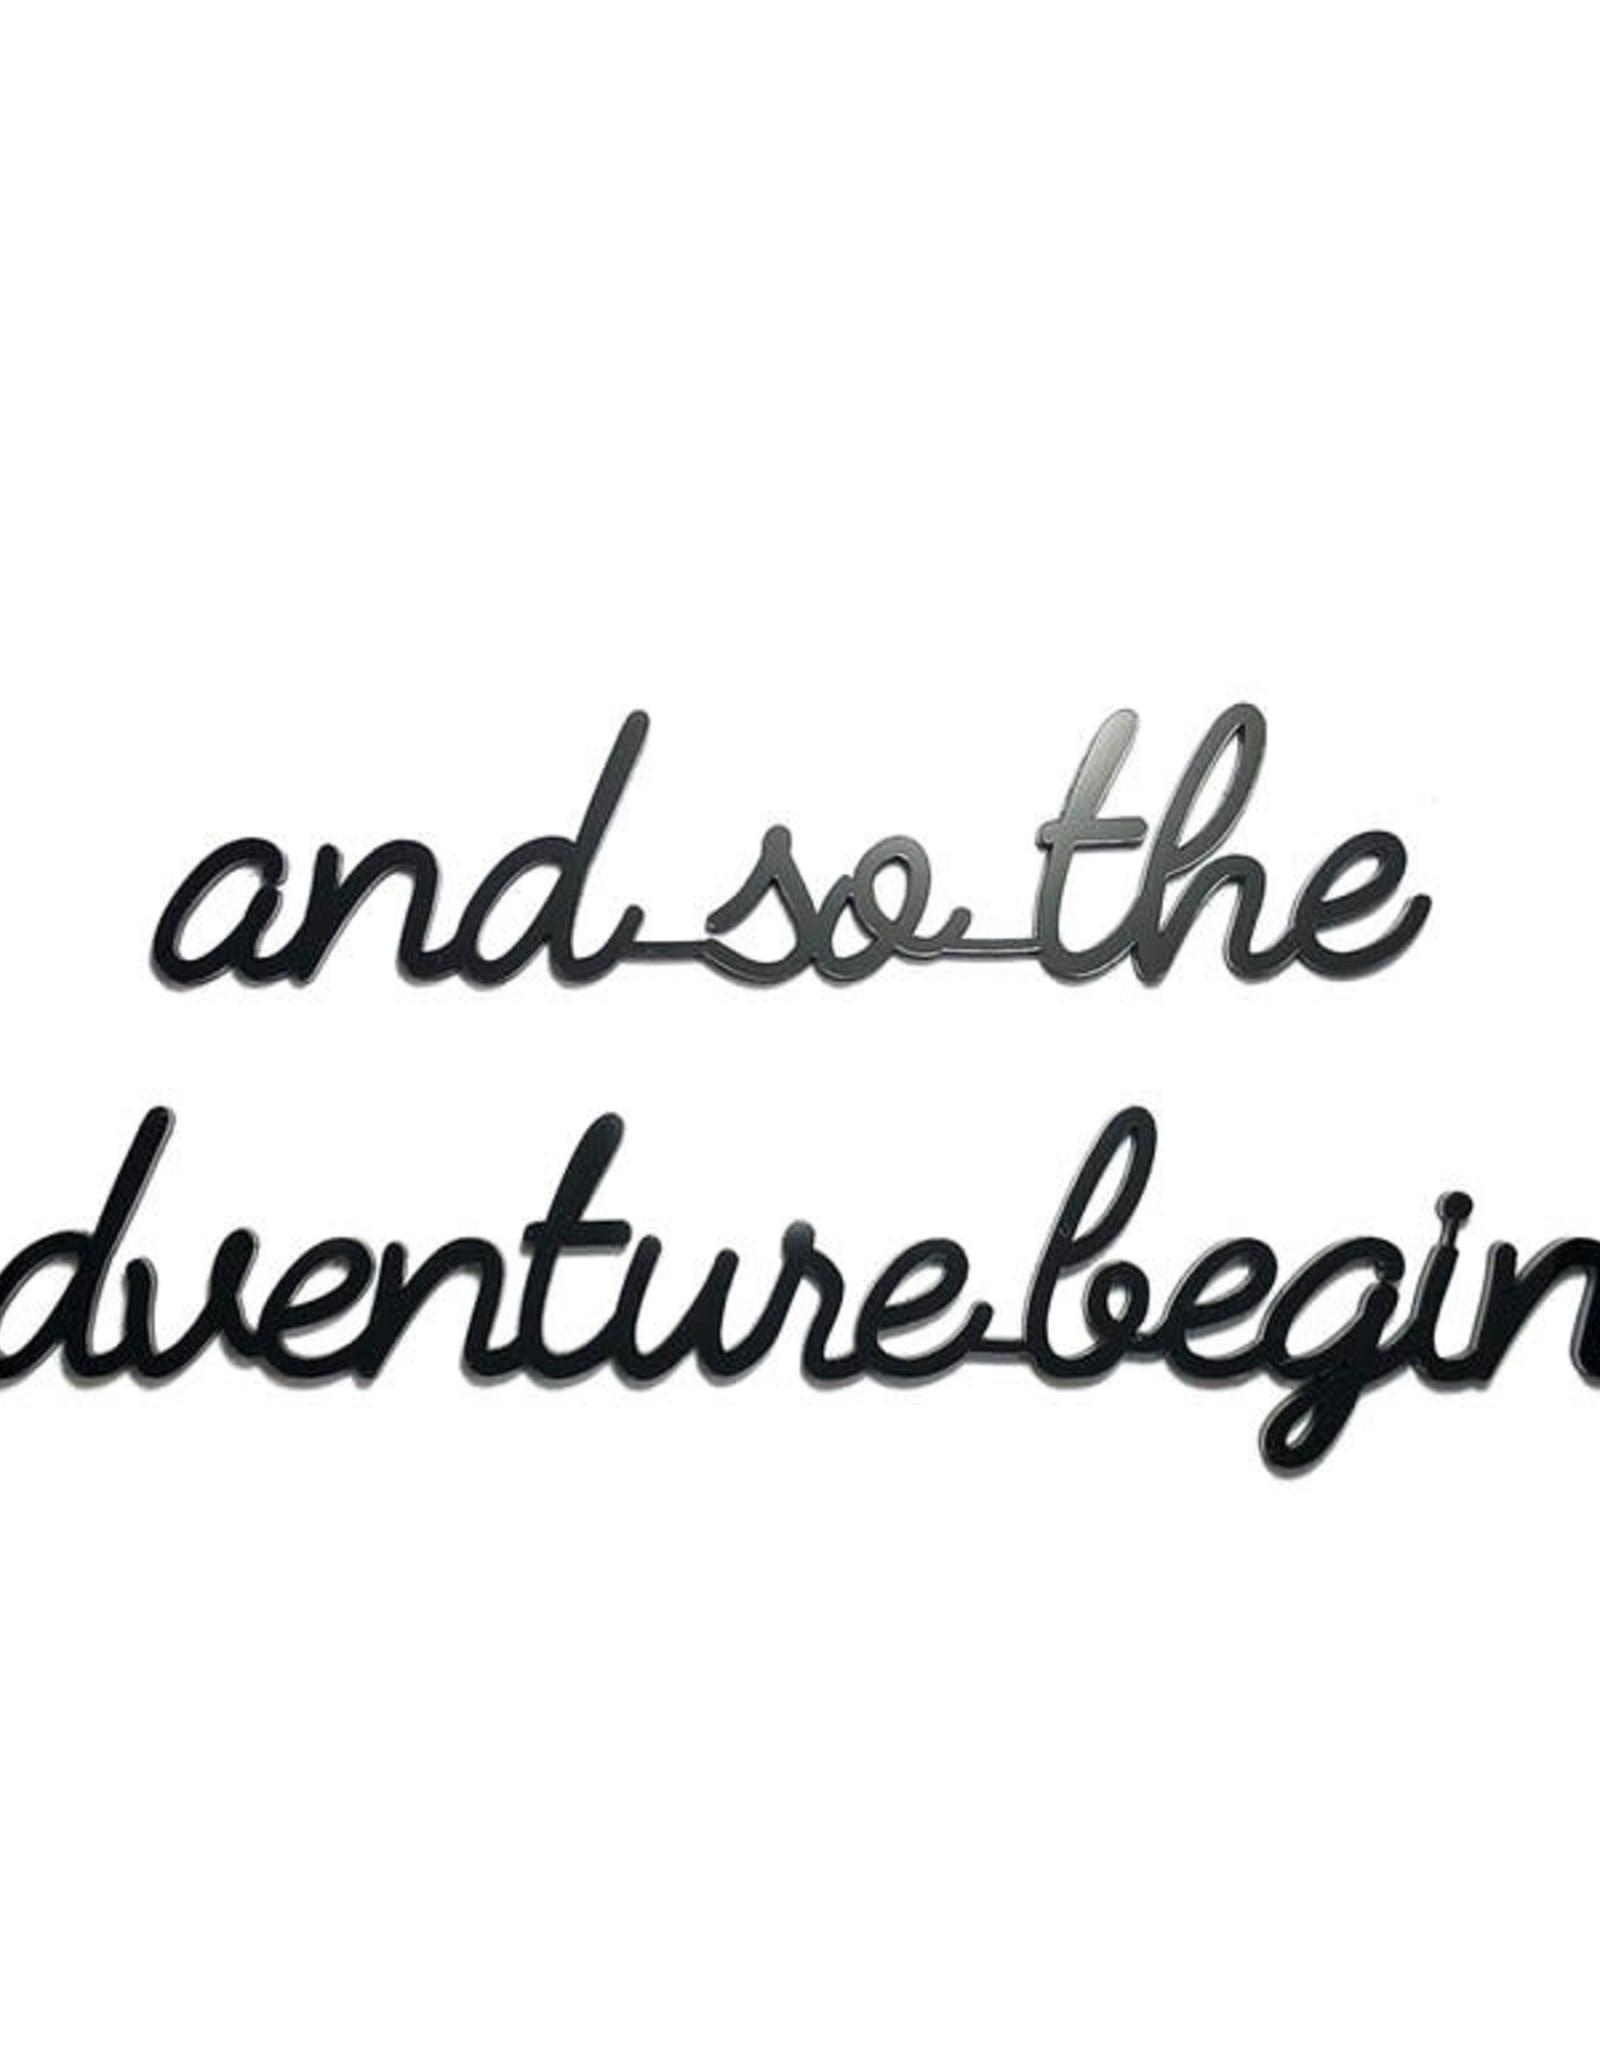 Goegezegd Goegezegd - And so the adventure begins